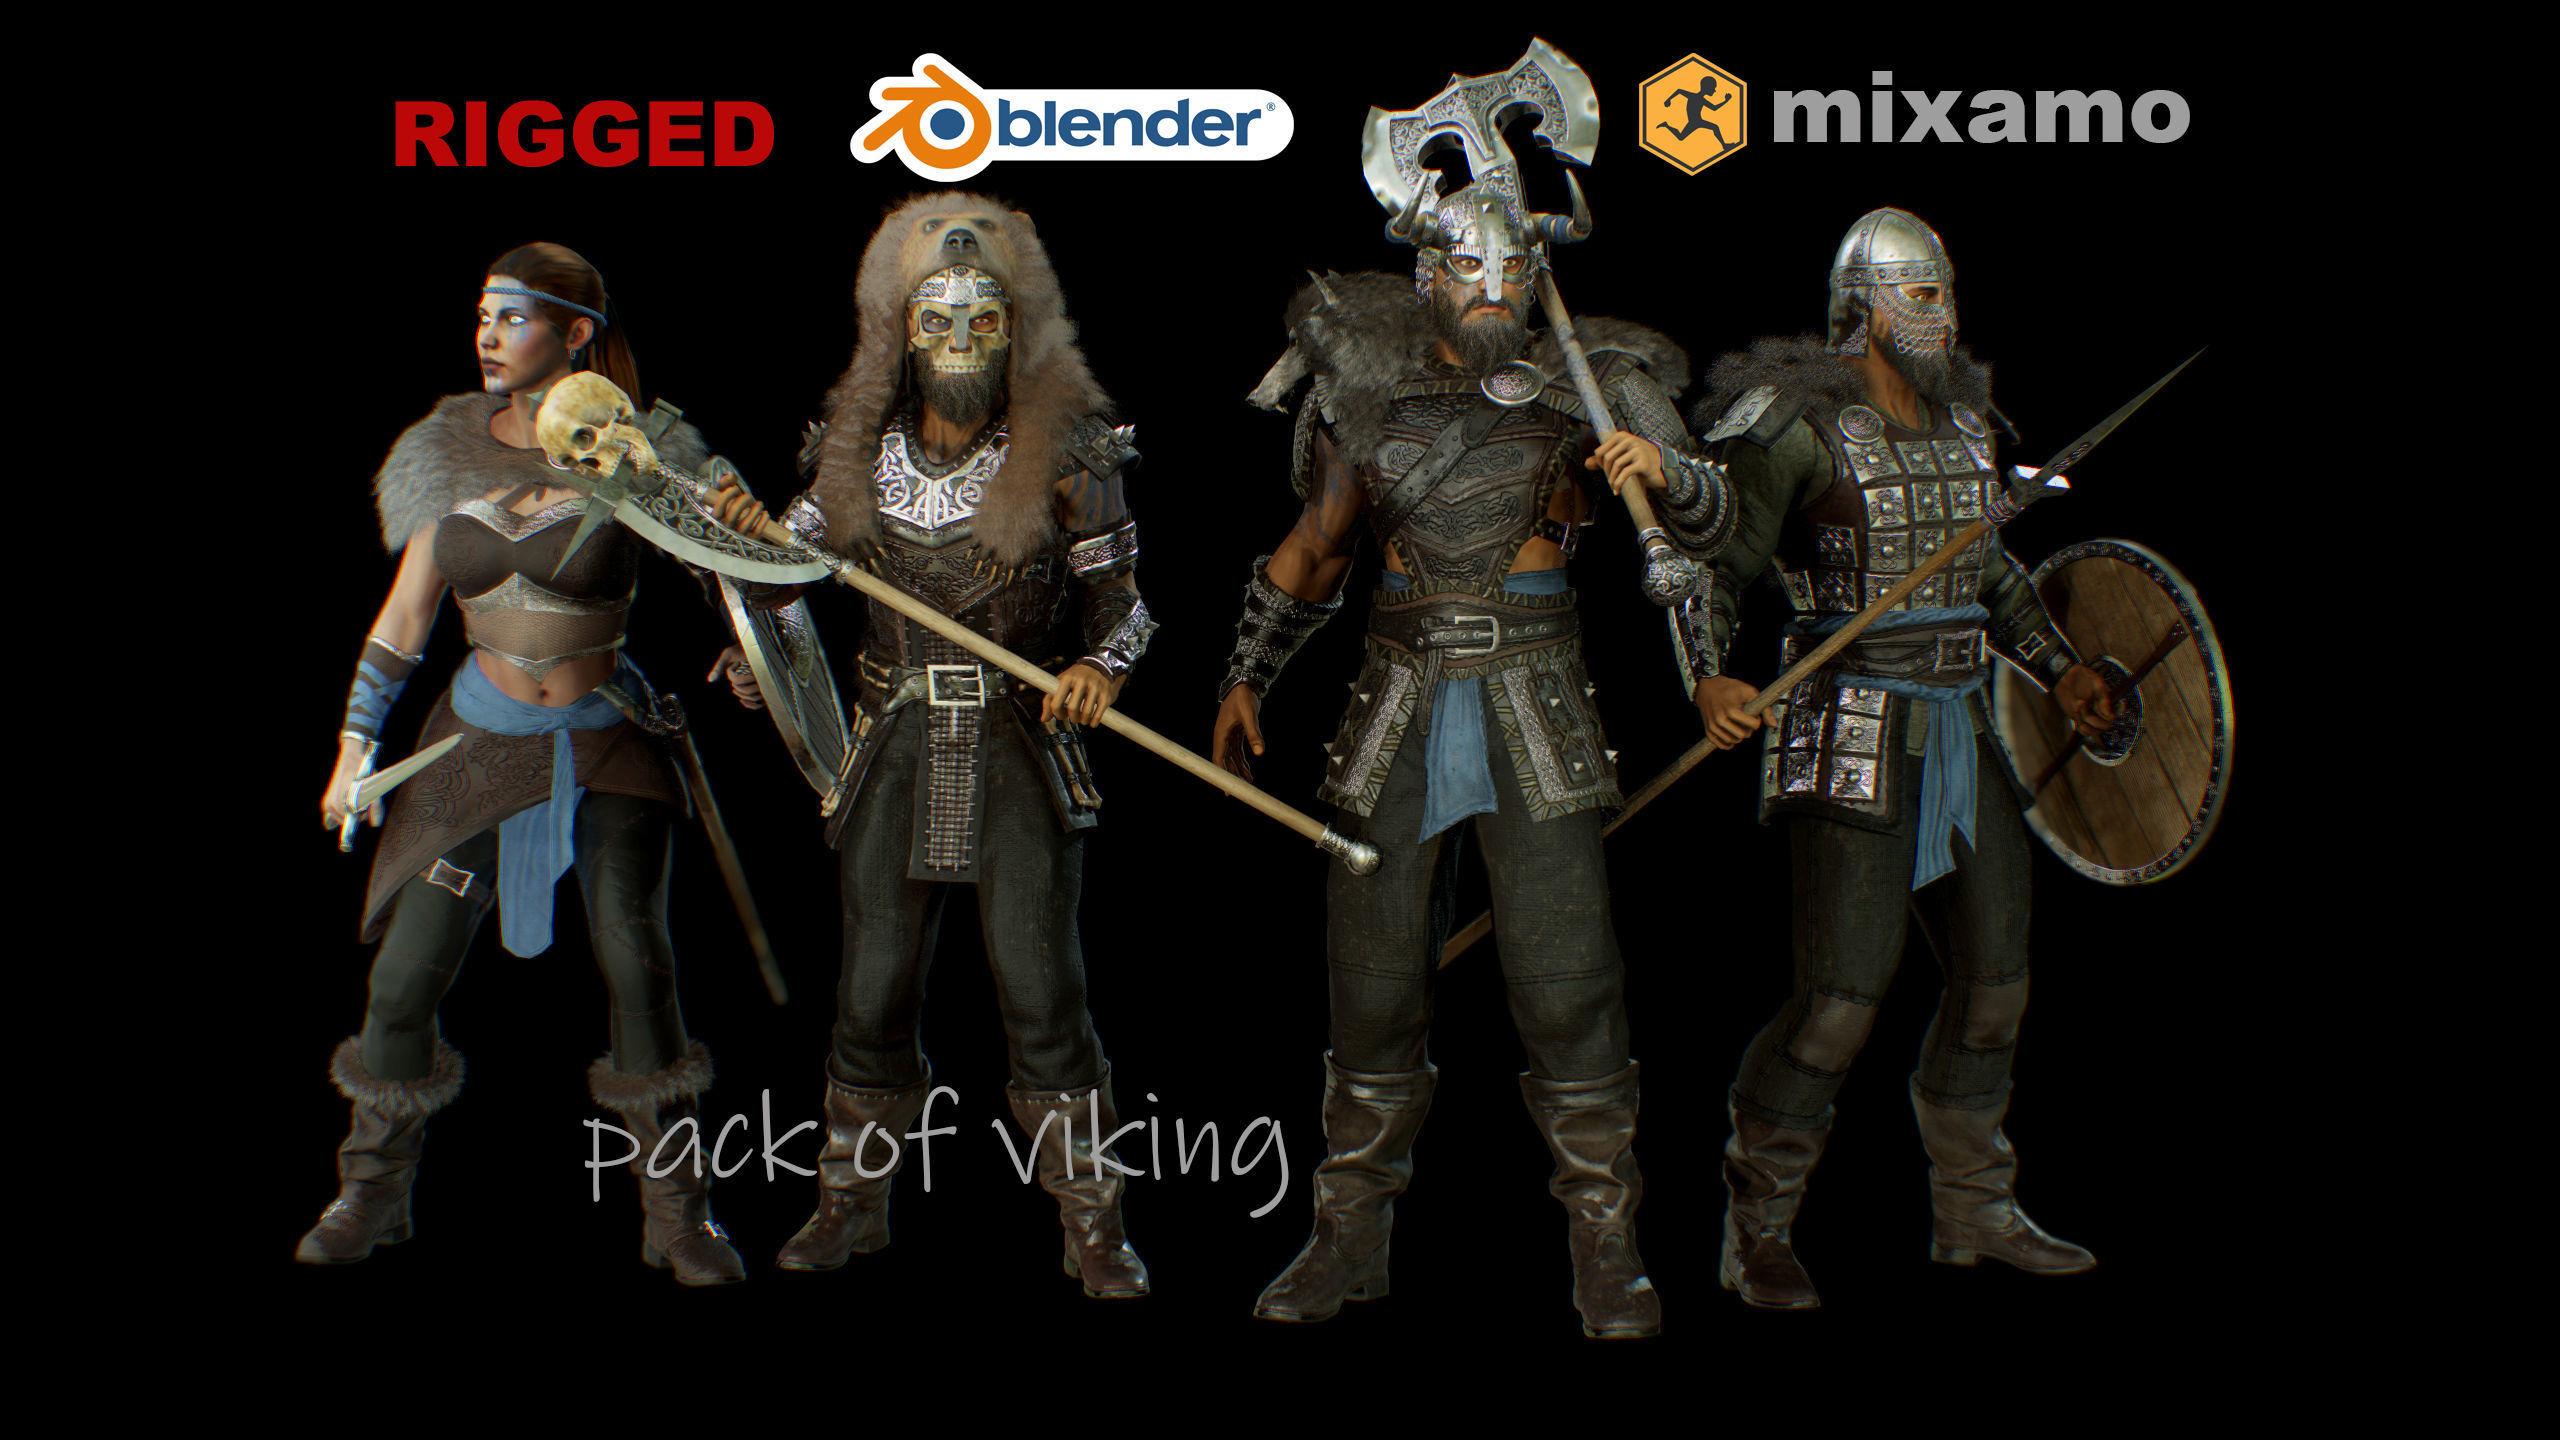 pack of viking